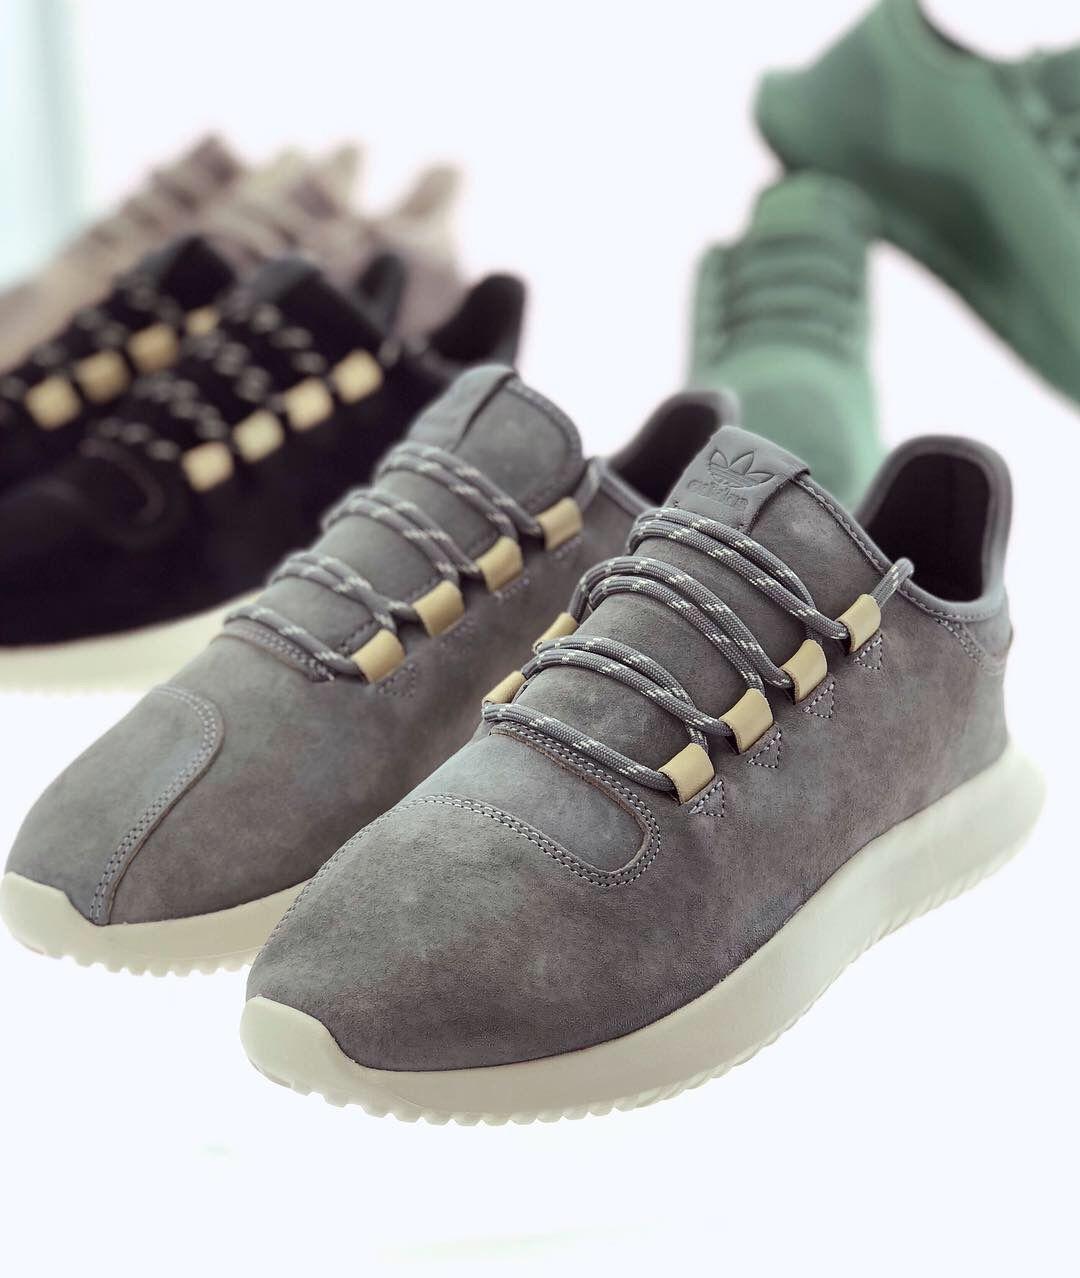 adidas Originals Tubular Shadow Damen Sneaker BY9740 für nur